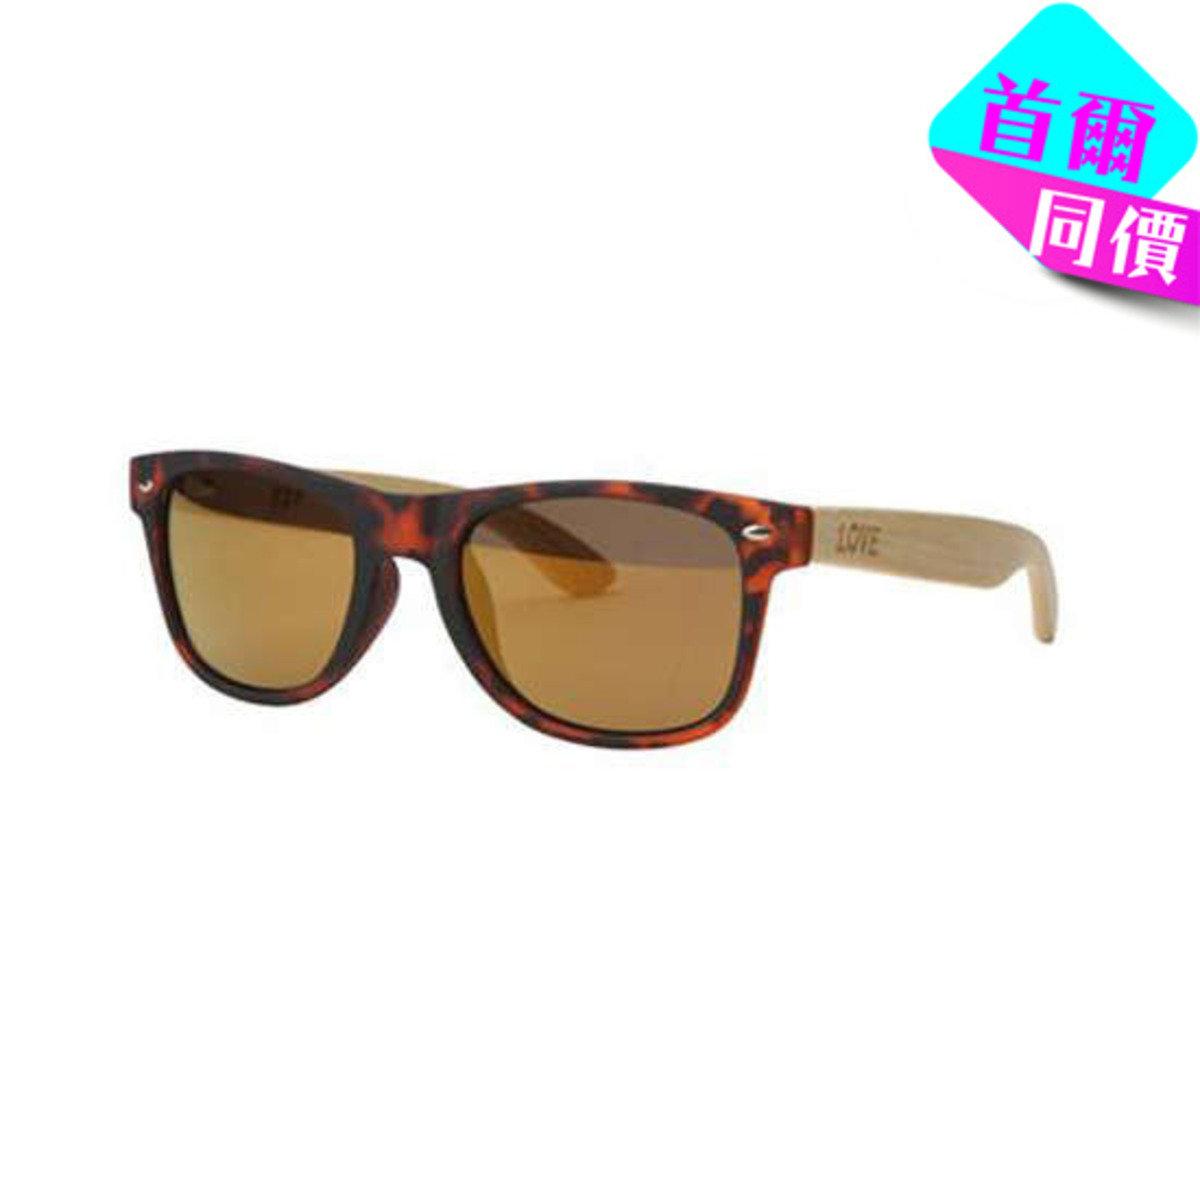 MATTE LEOPARD - 啡色豹紋框竹柄太陽眼鏡